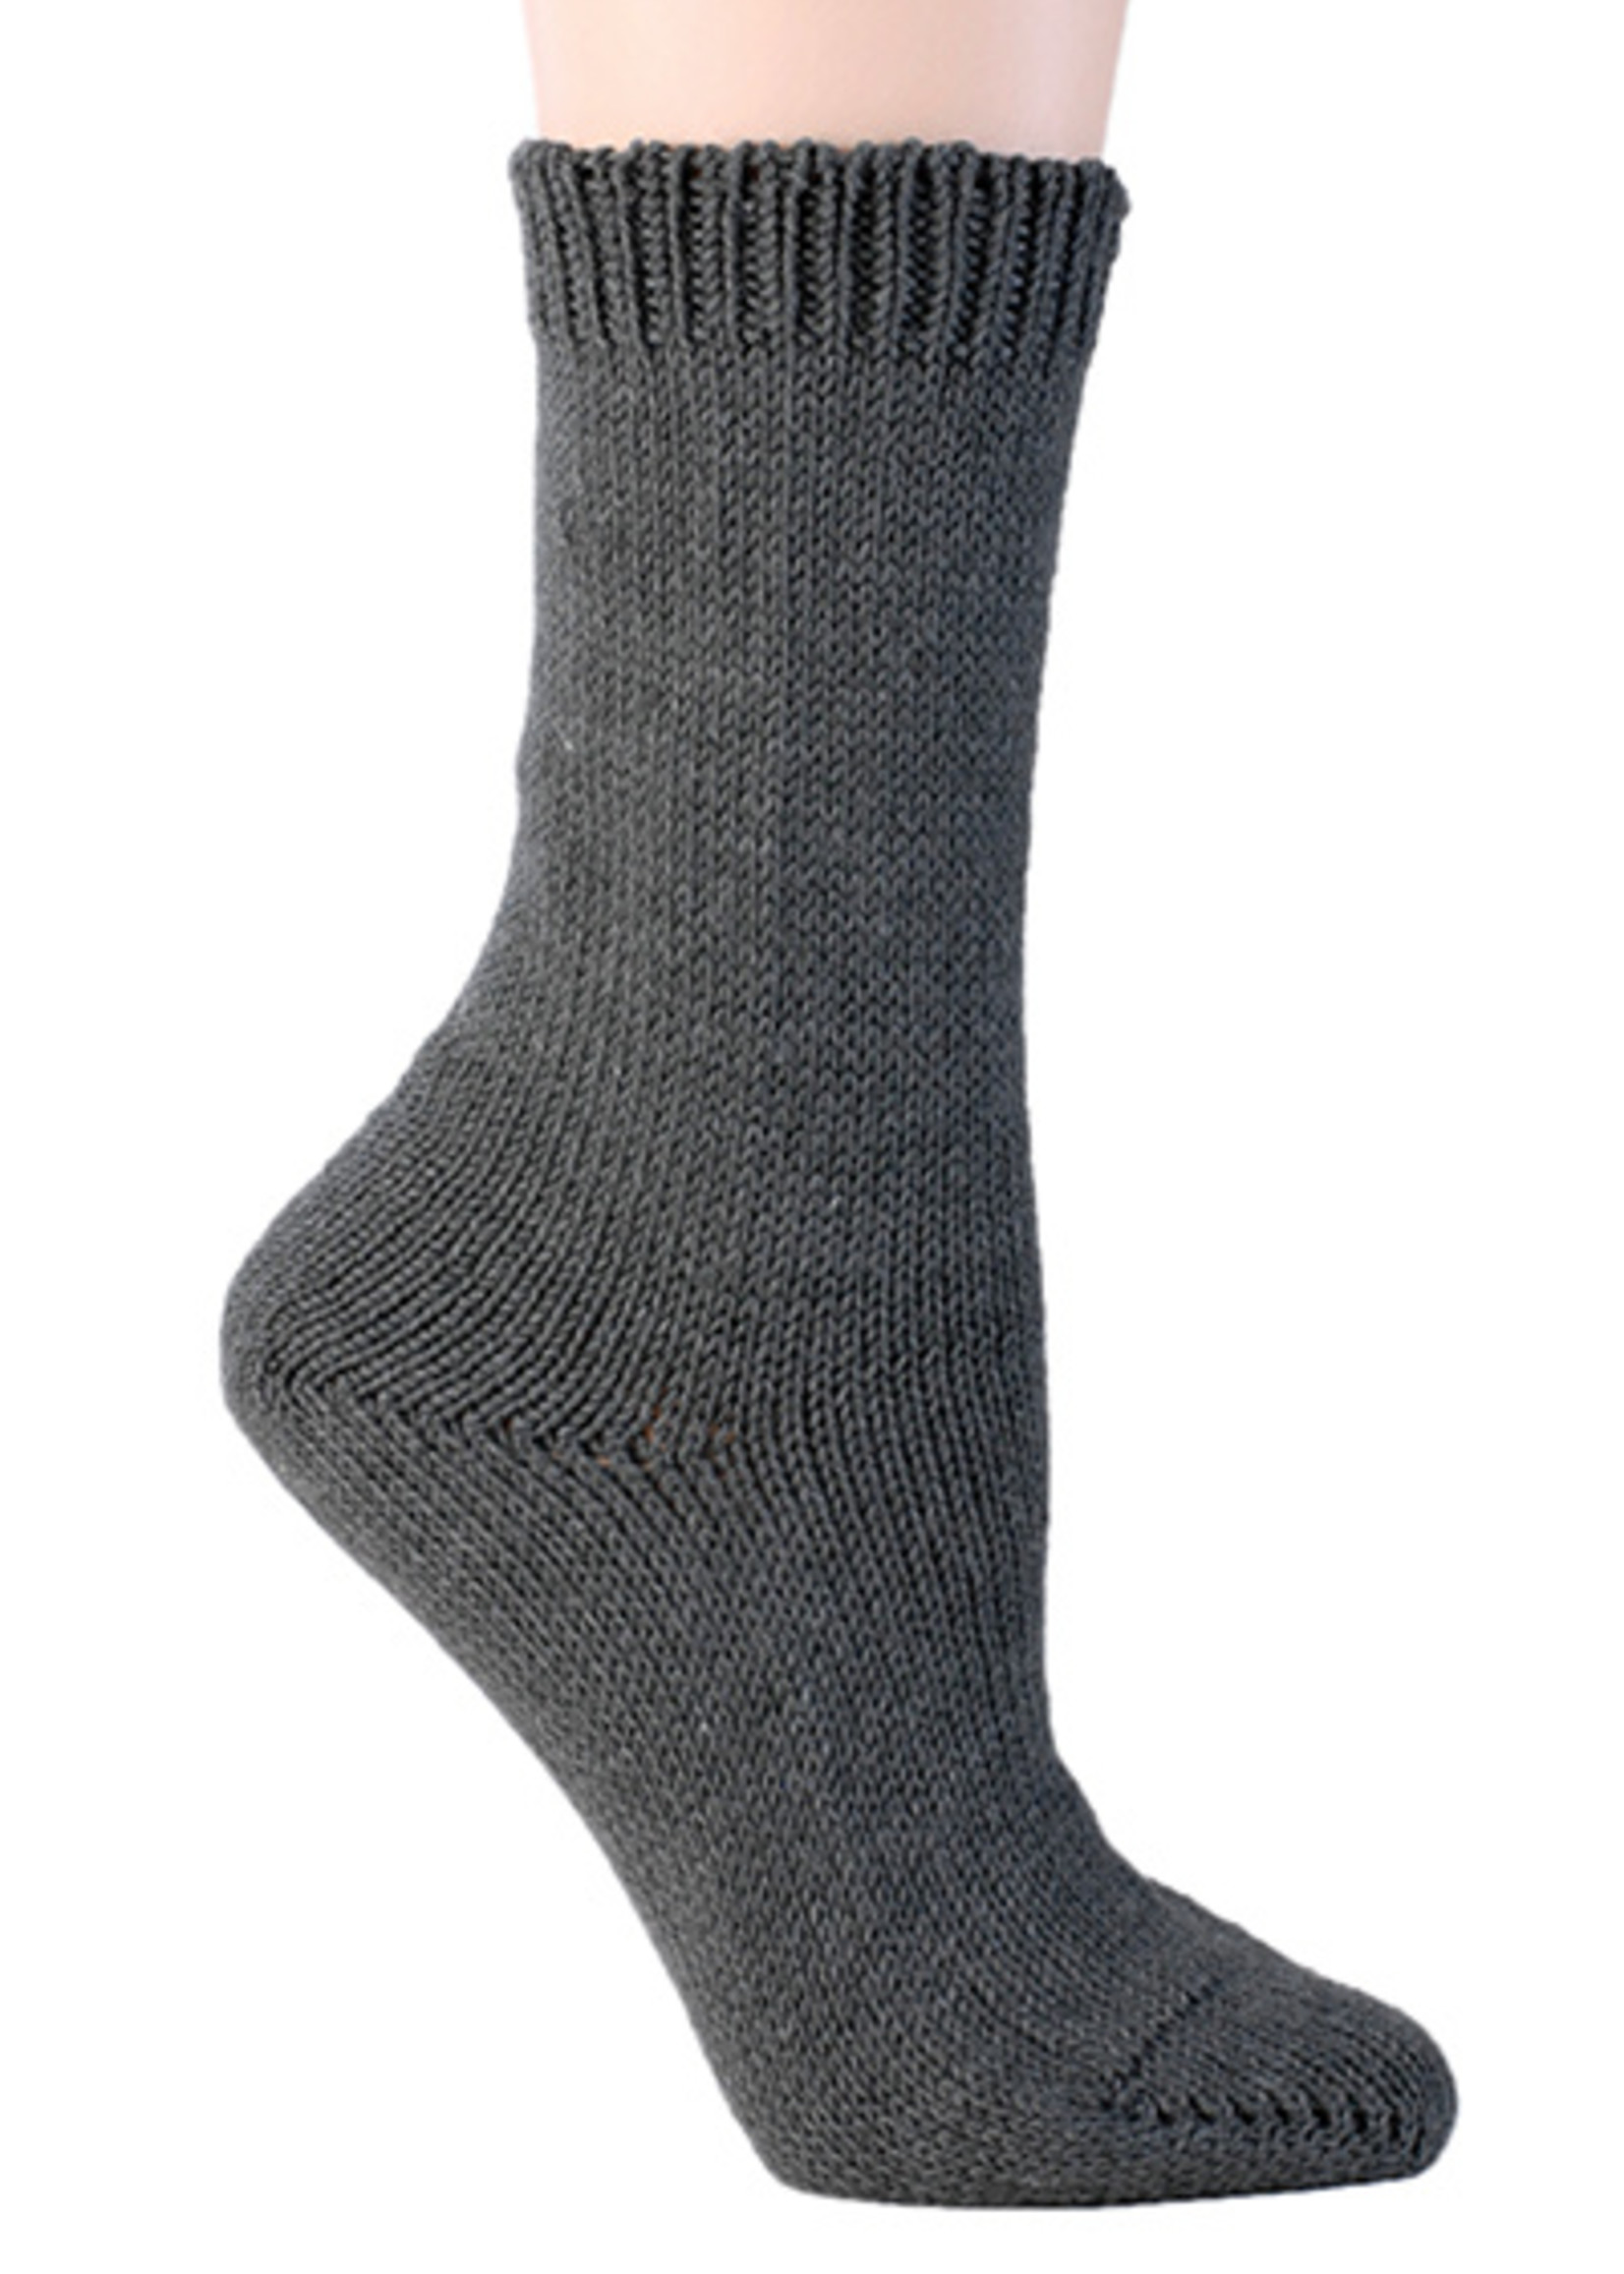 Berroco Berroco Comfort Sock Yarn #1713 Dusk